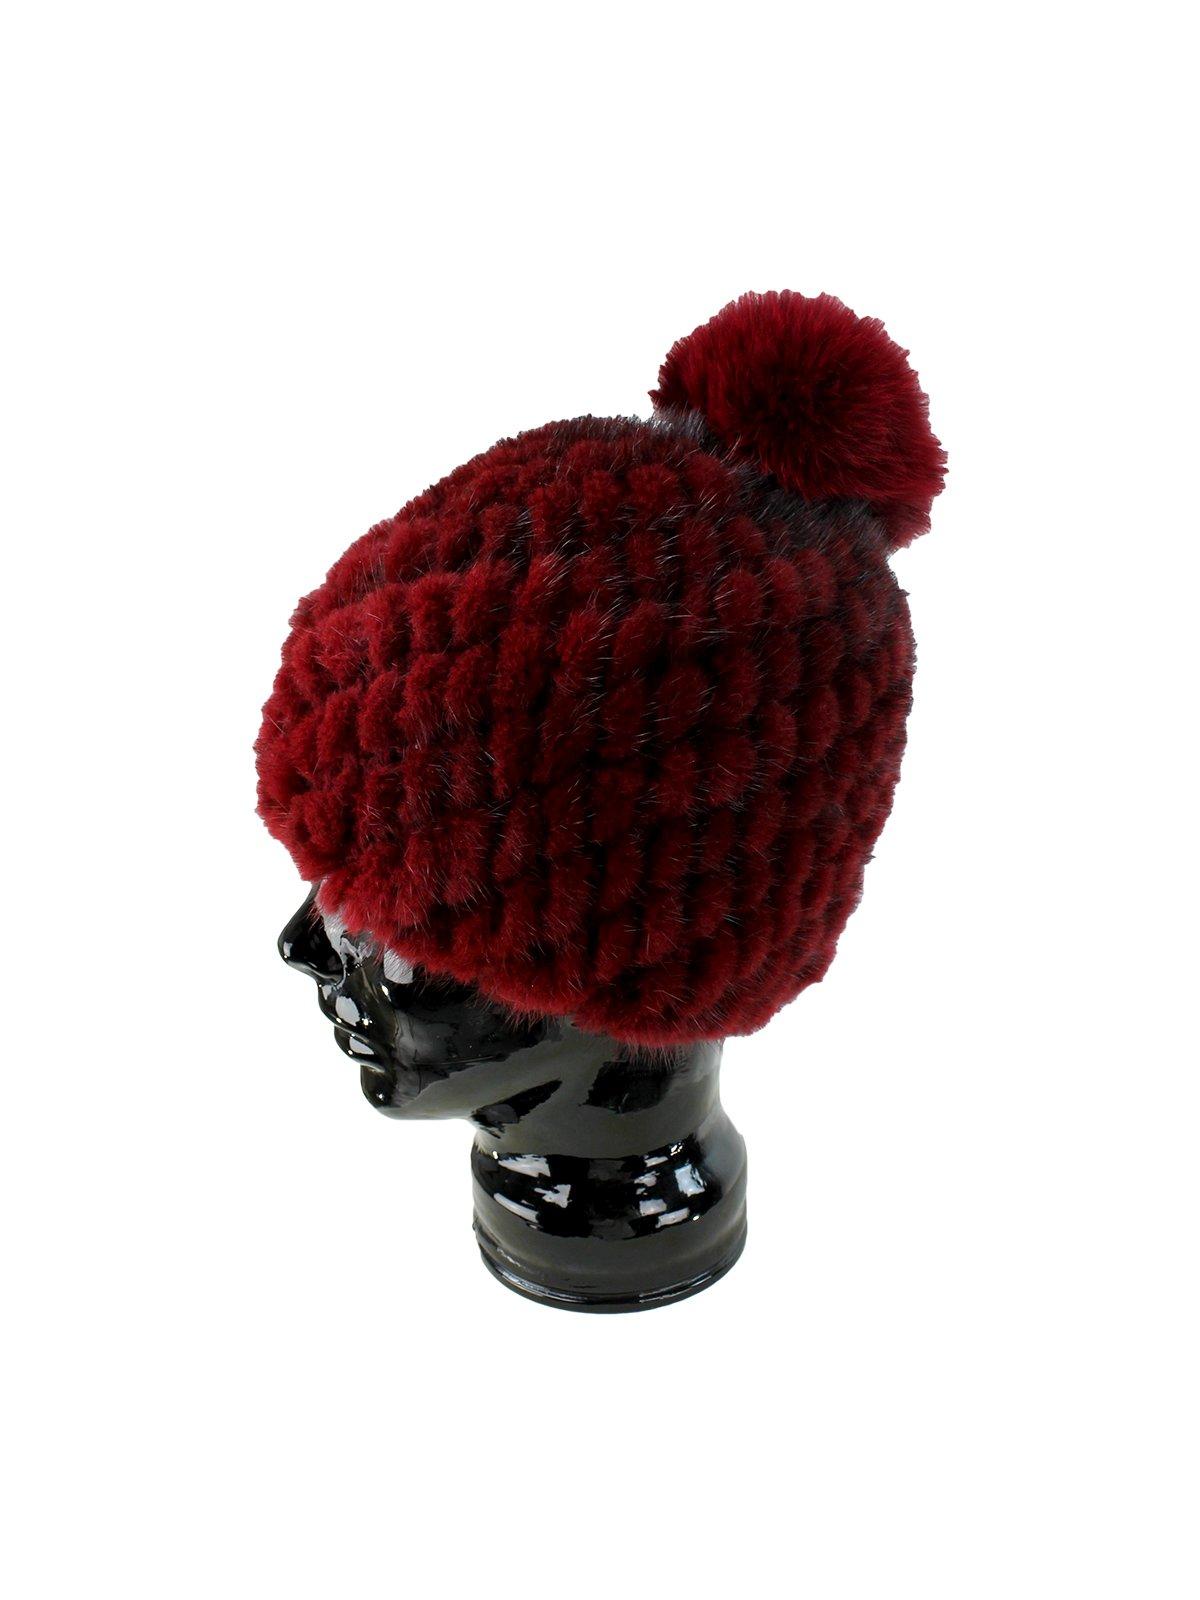 655e1746d1f Burgundy Womens Knit Mink Fur Hat with Fox Fur Pom Pom